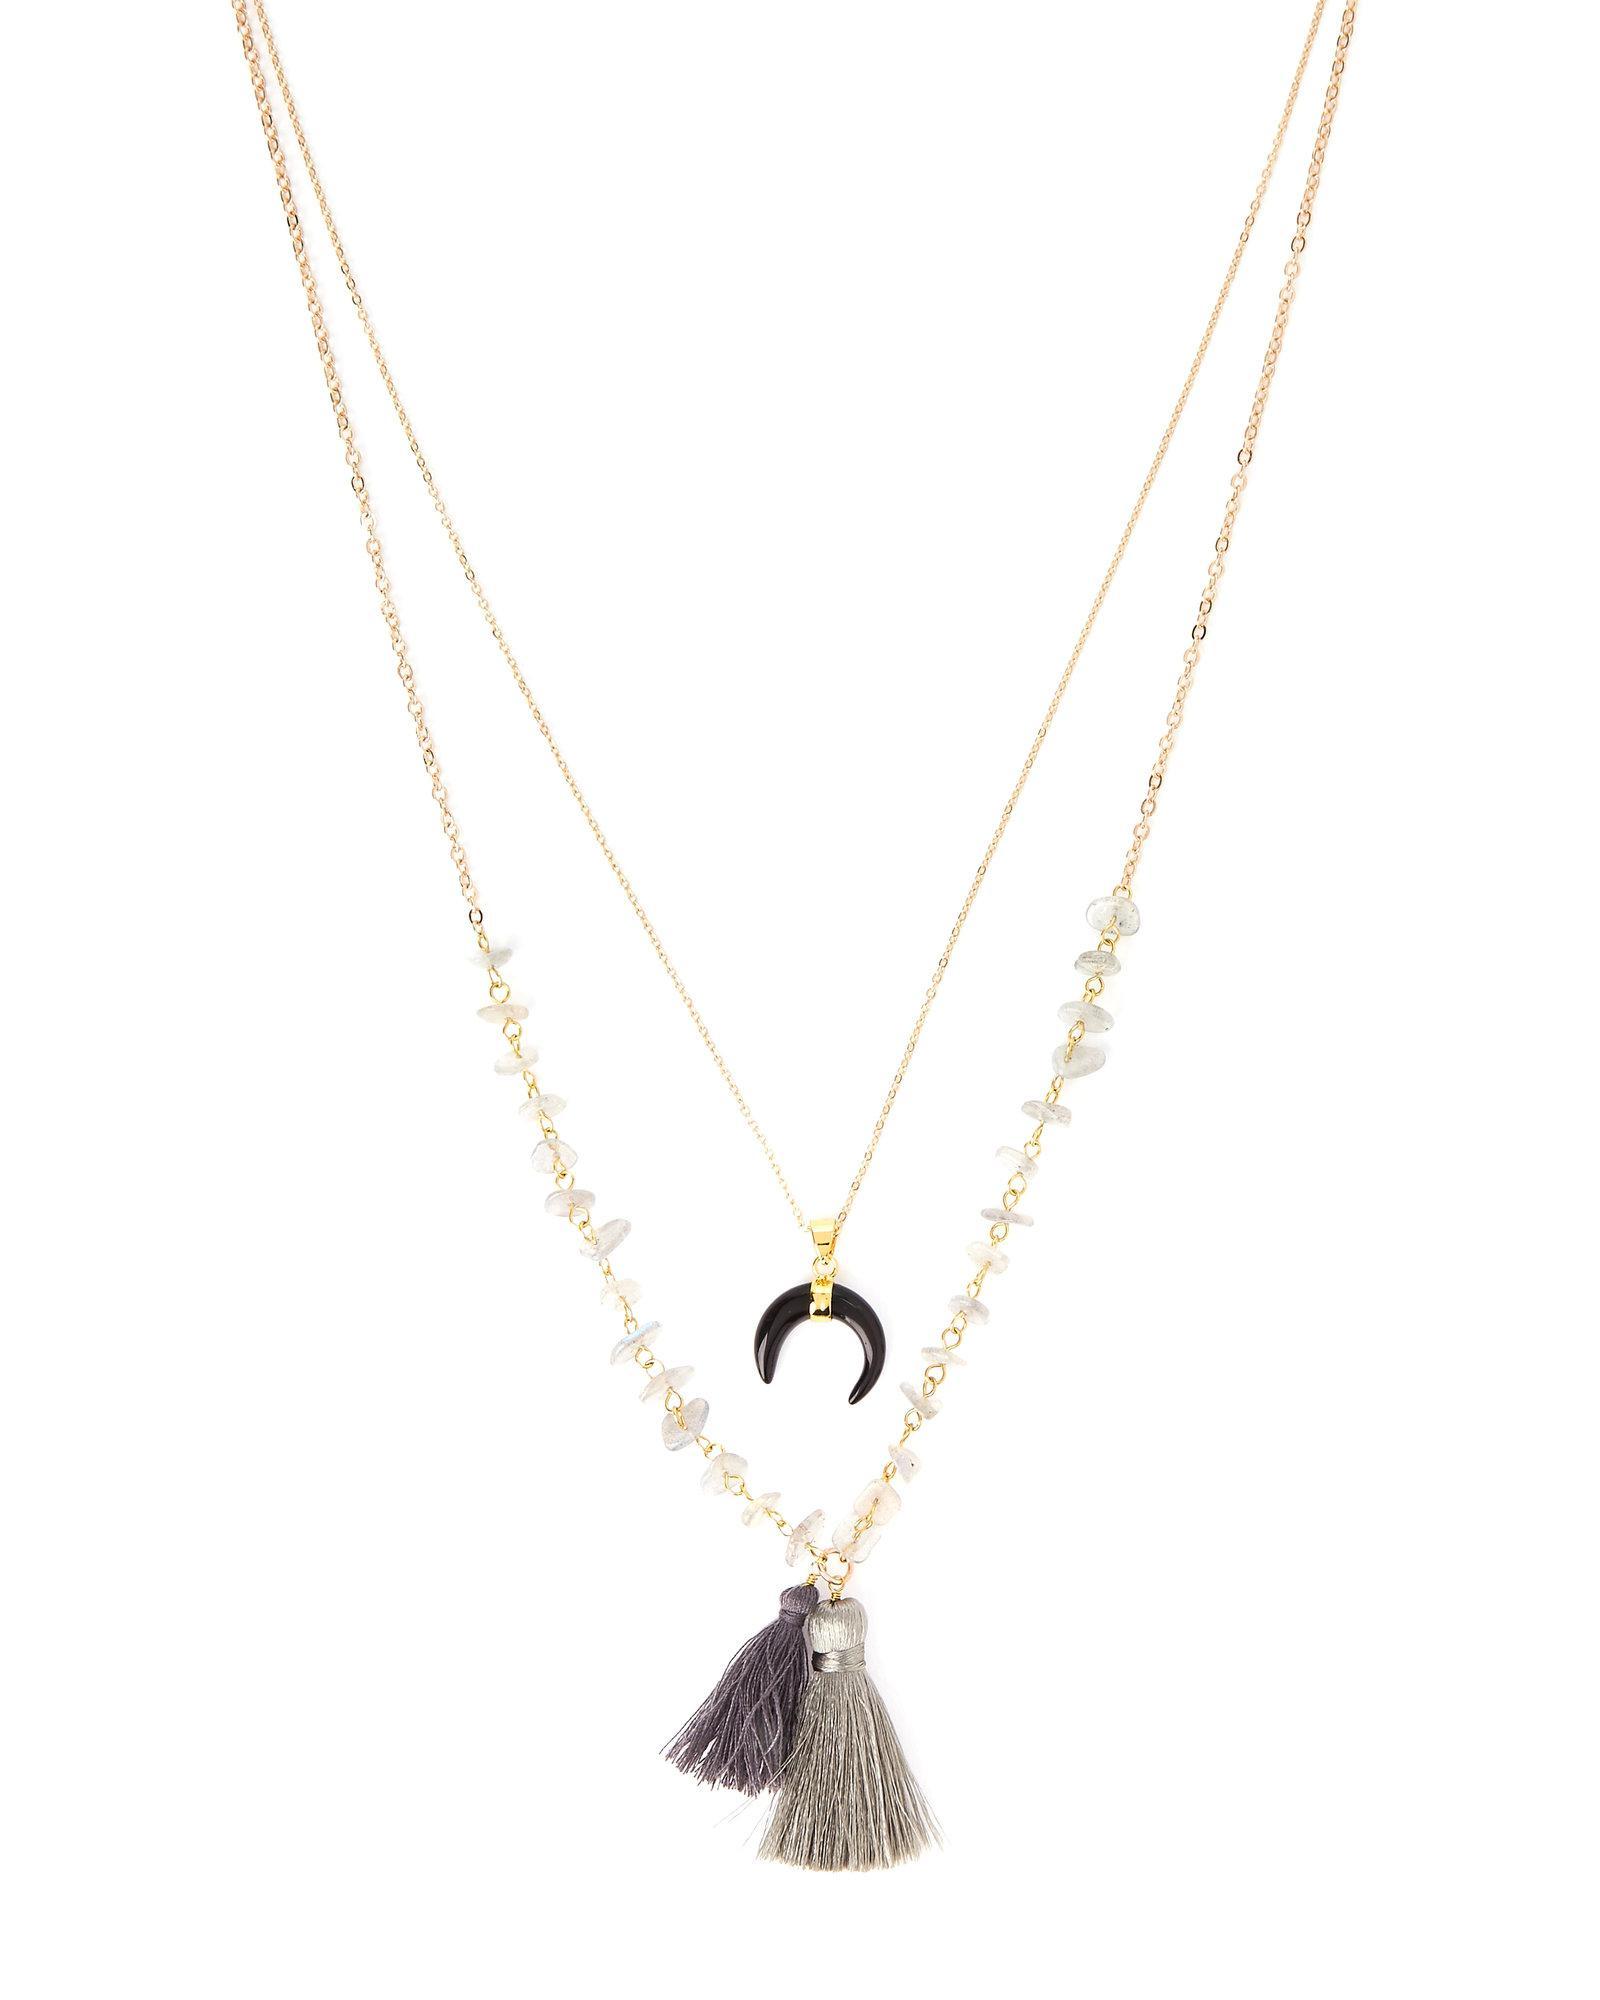 Panacea Triple Layer Tassel Necklace 94kJo7NHu2